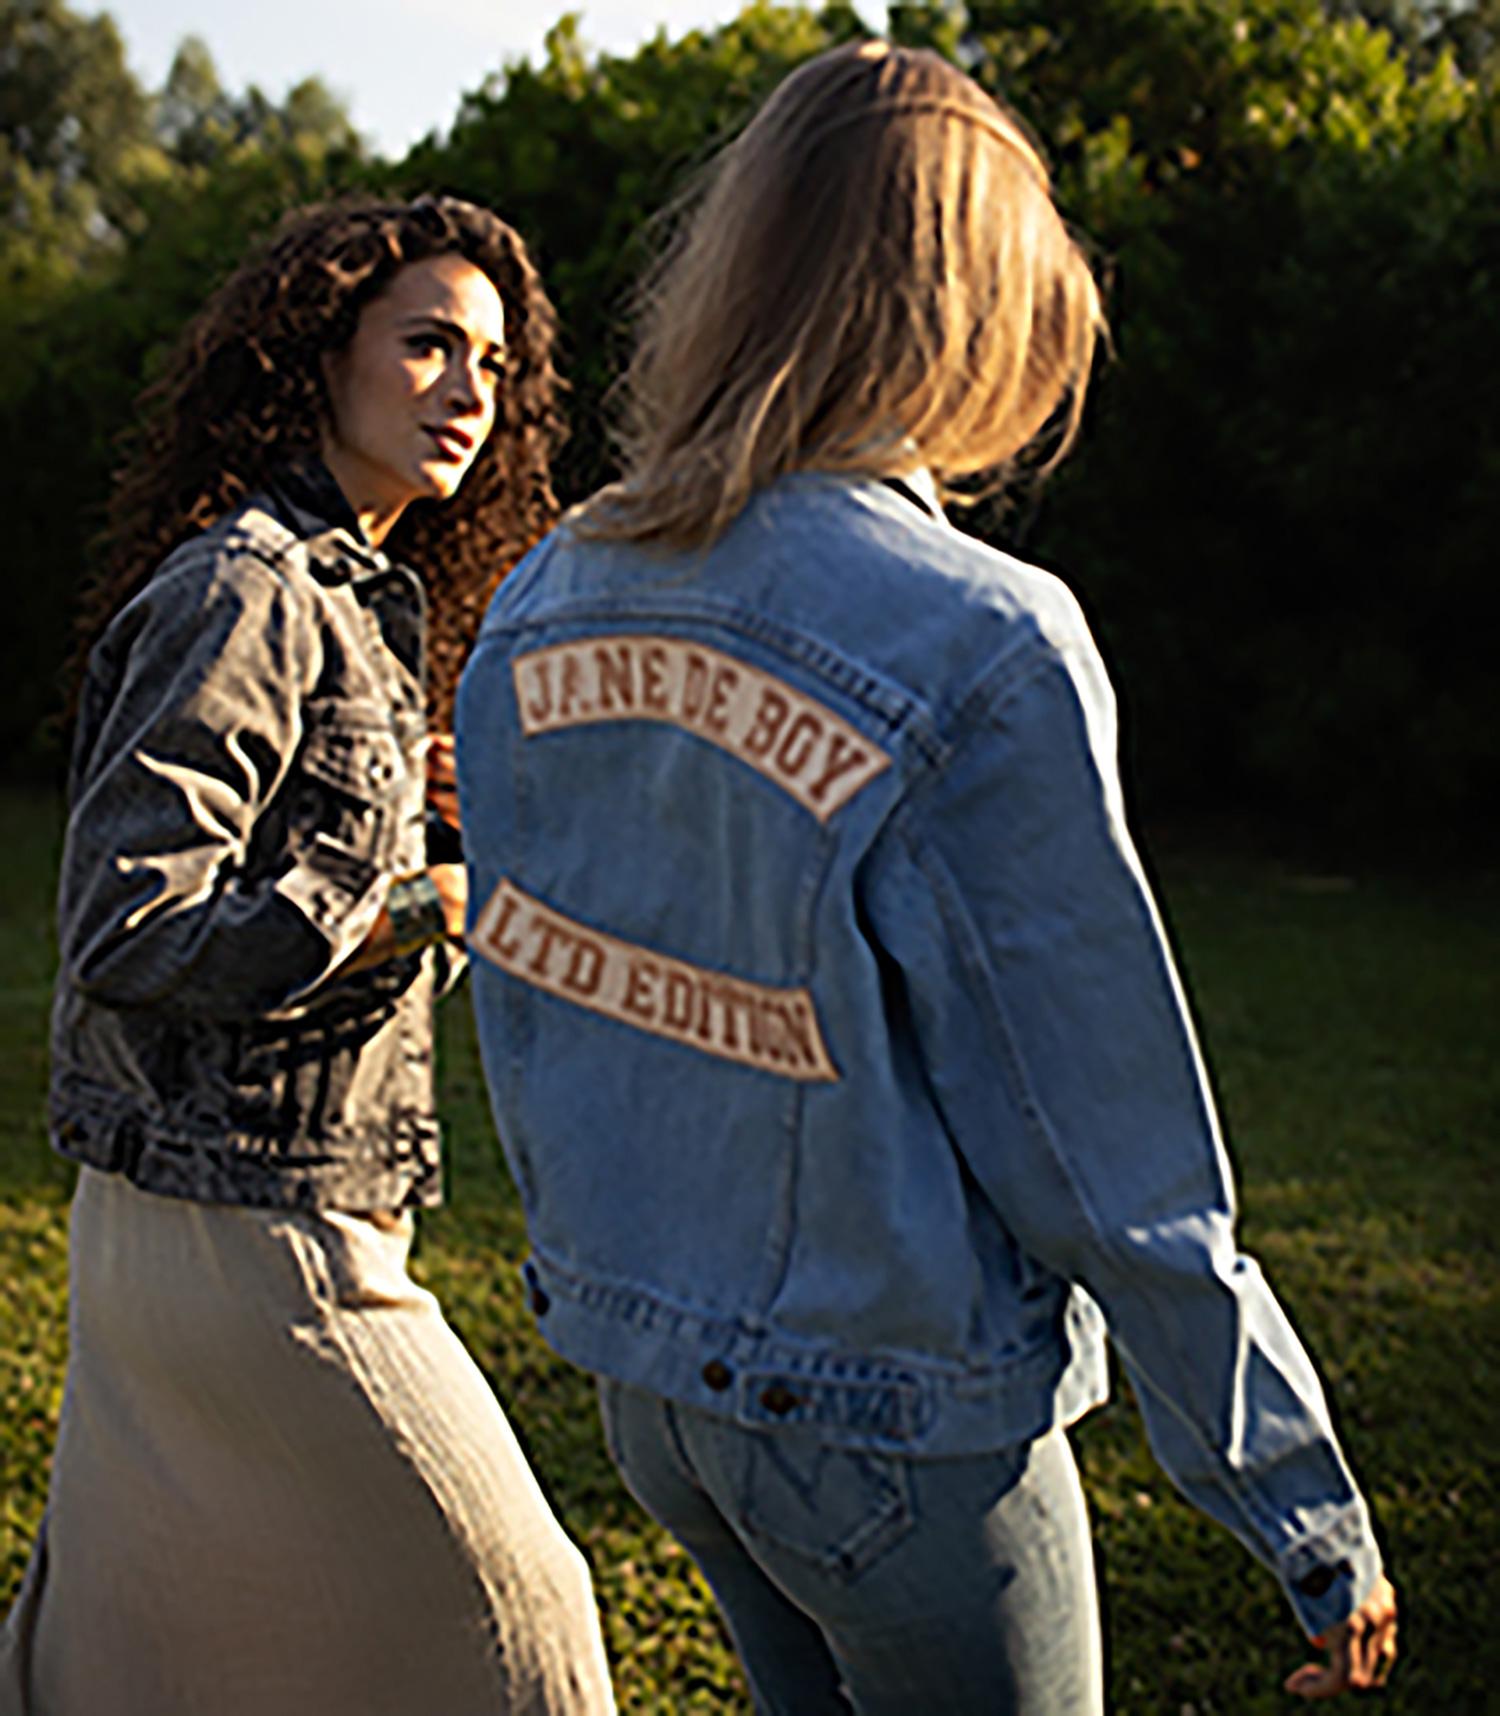 Blouson Denim Understated Leather x Jane de Boy